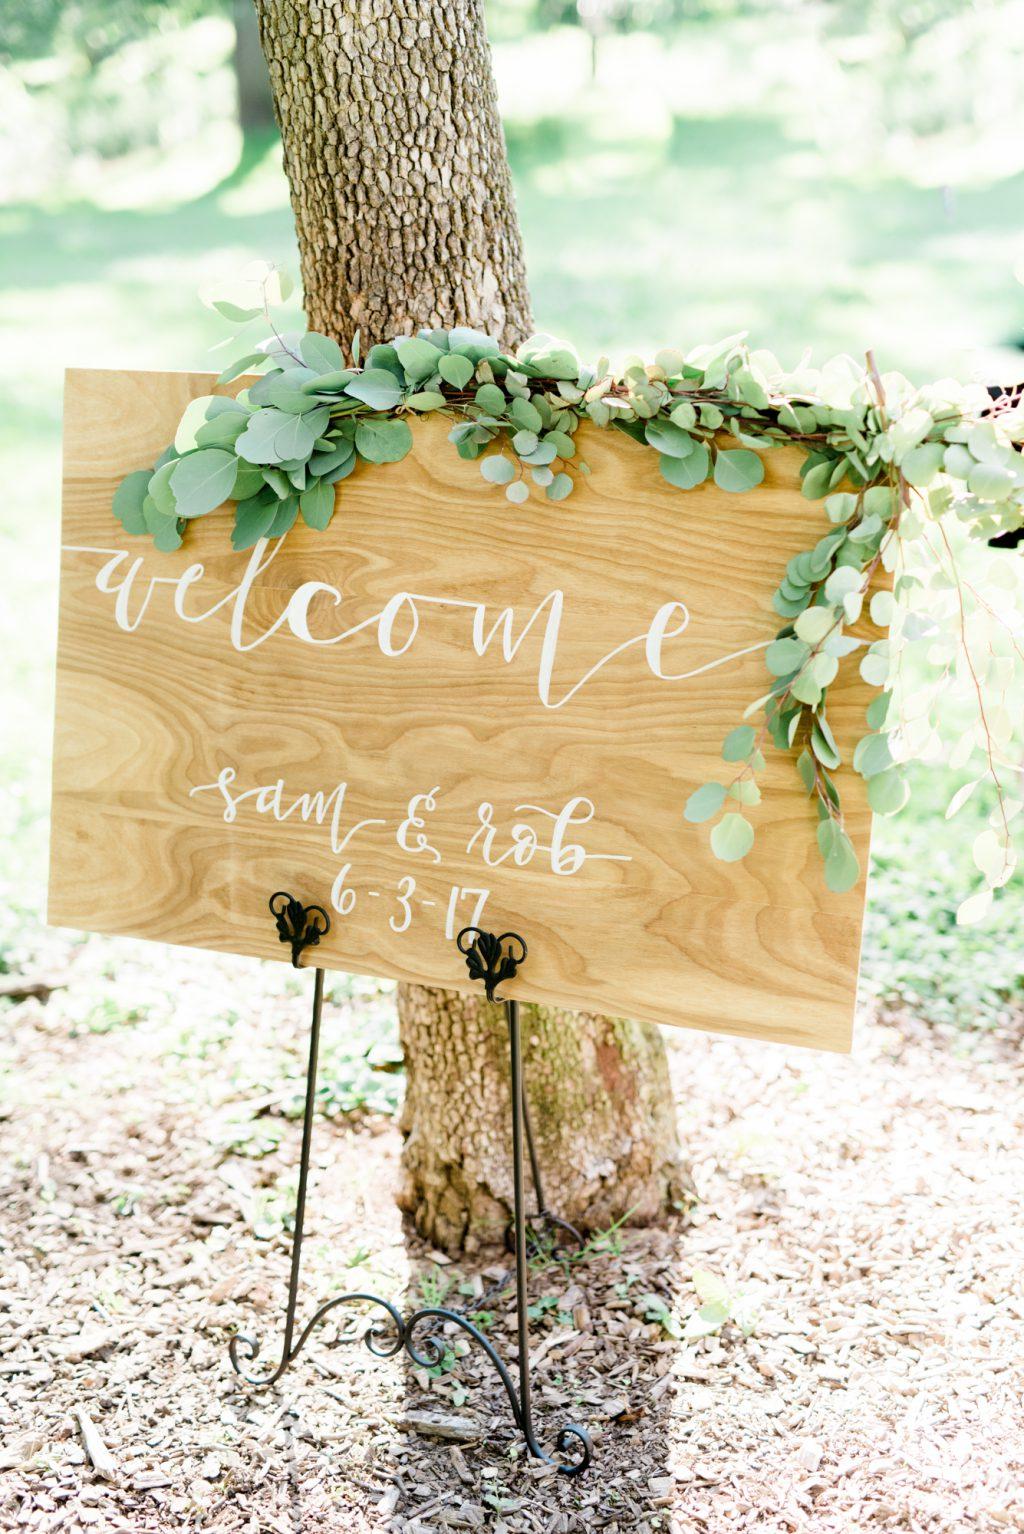 haley-richter-photo-west-chester-summer-wedding-boxcar-brewery-133